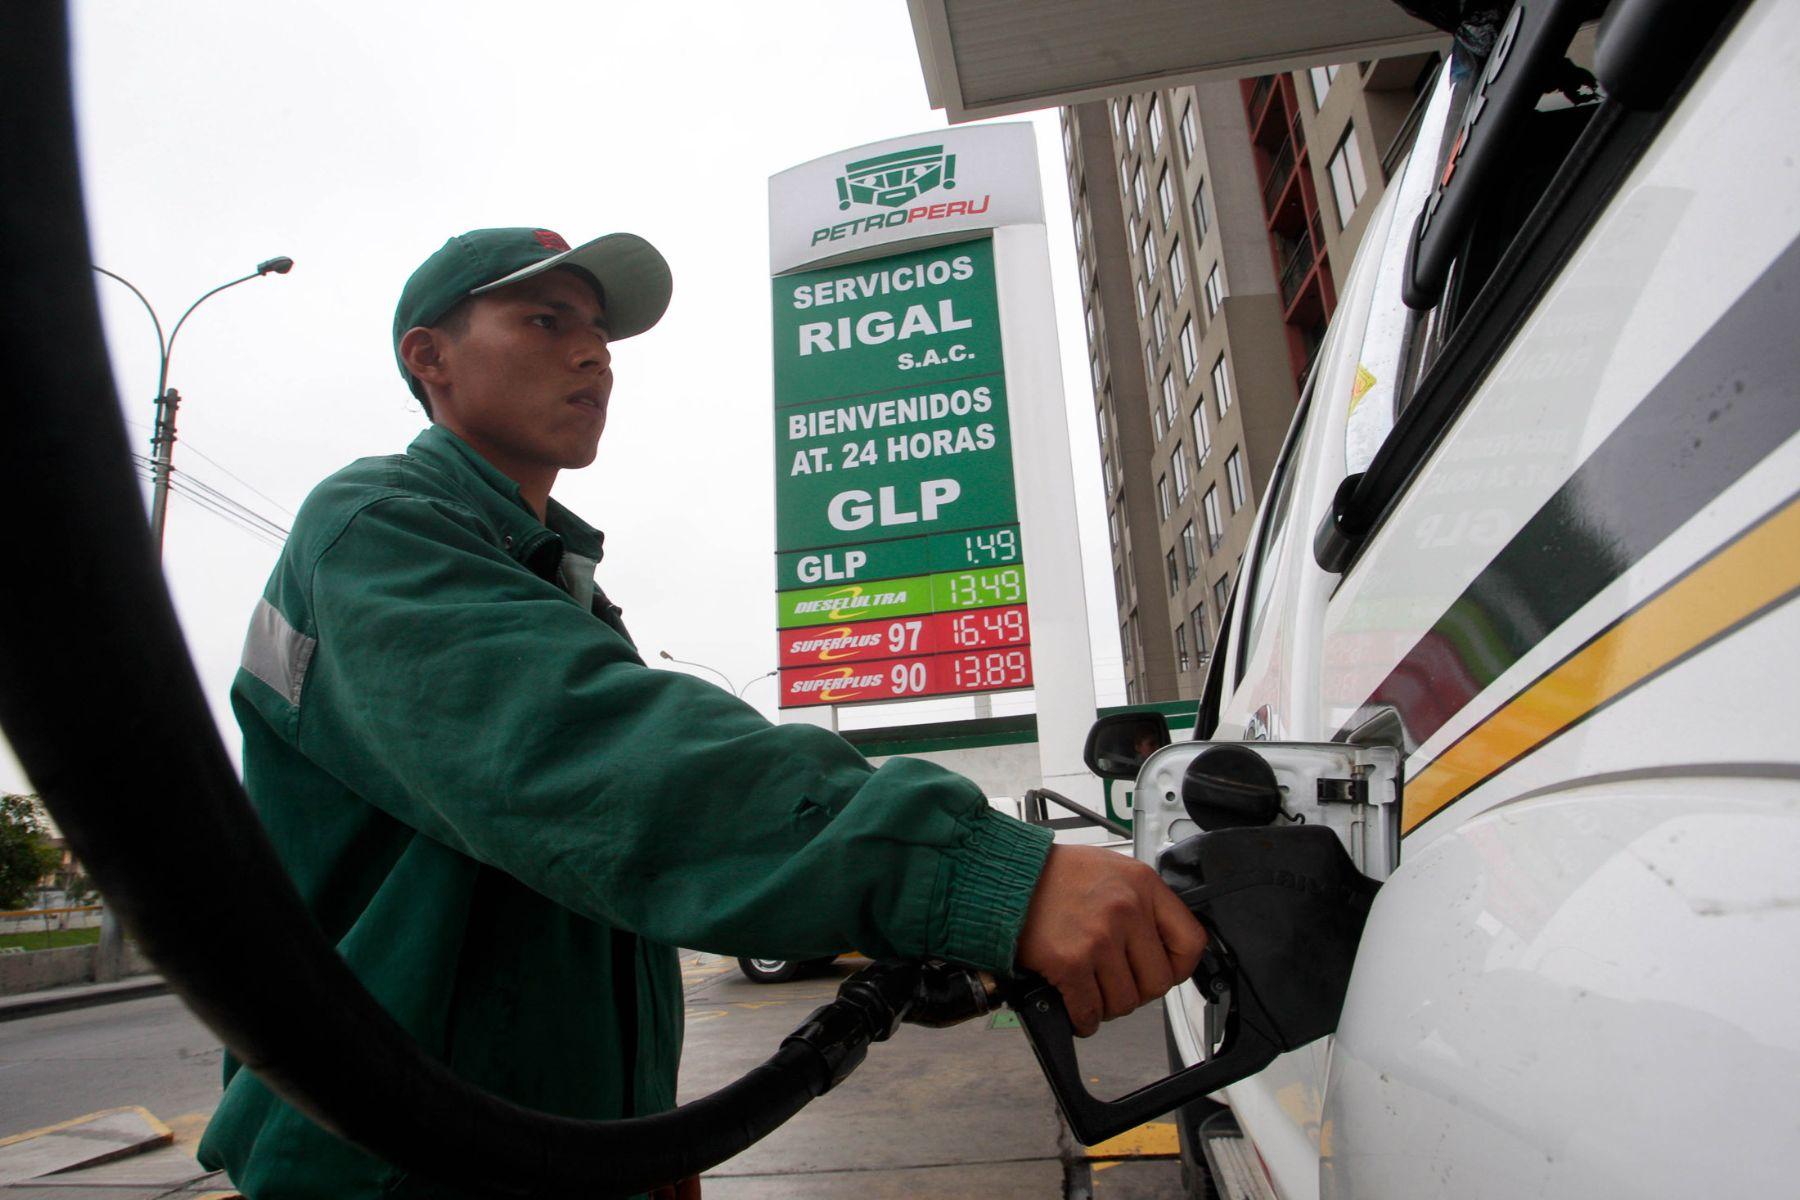 Ampliar red de grifos de Petroperú favorecerá acceso a combustible en zonas desatendidas